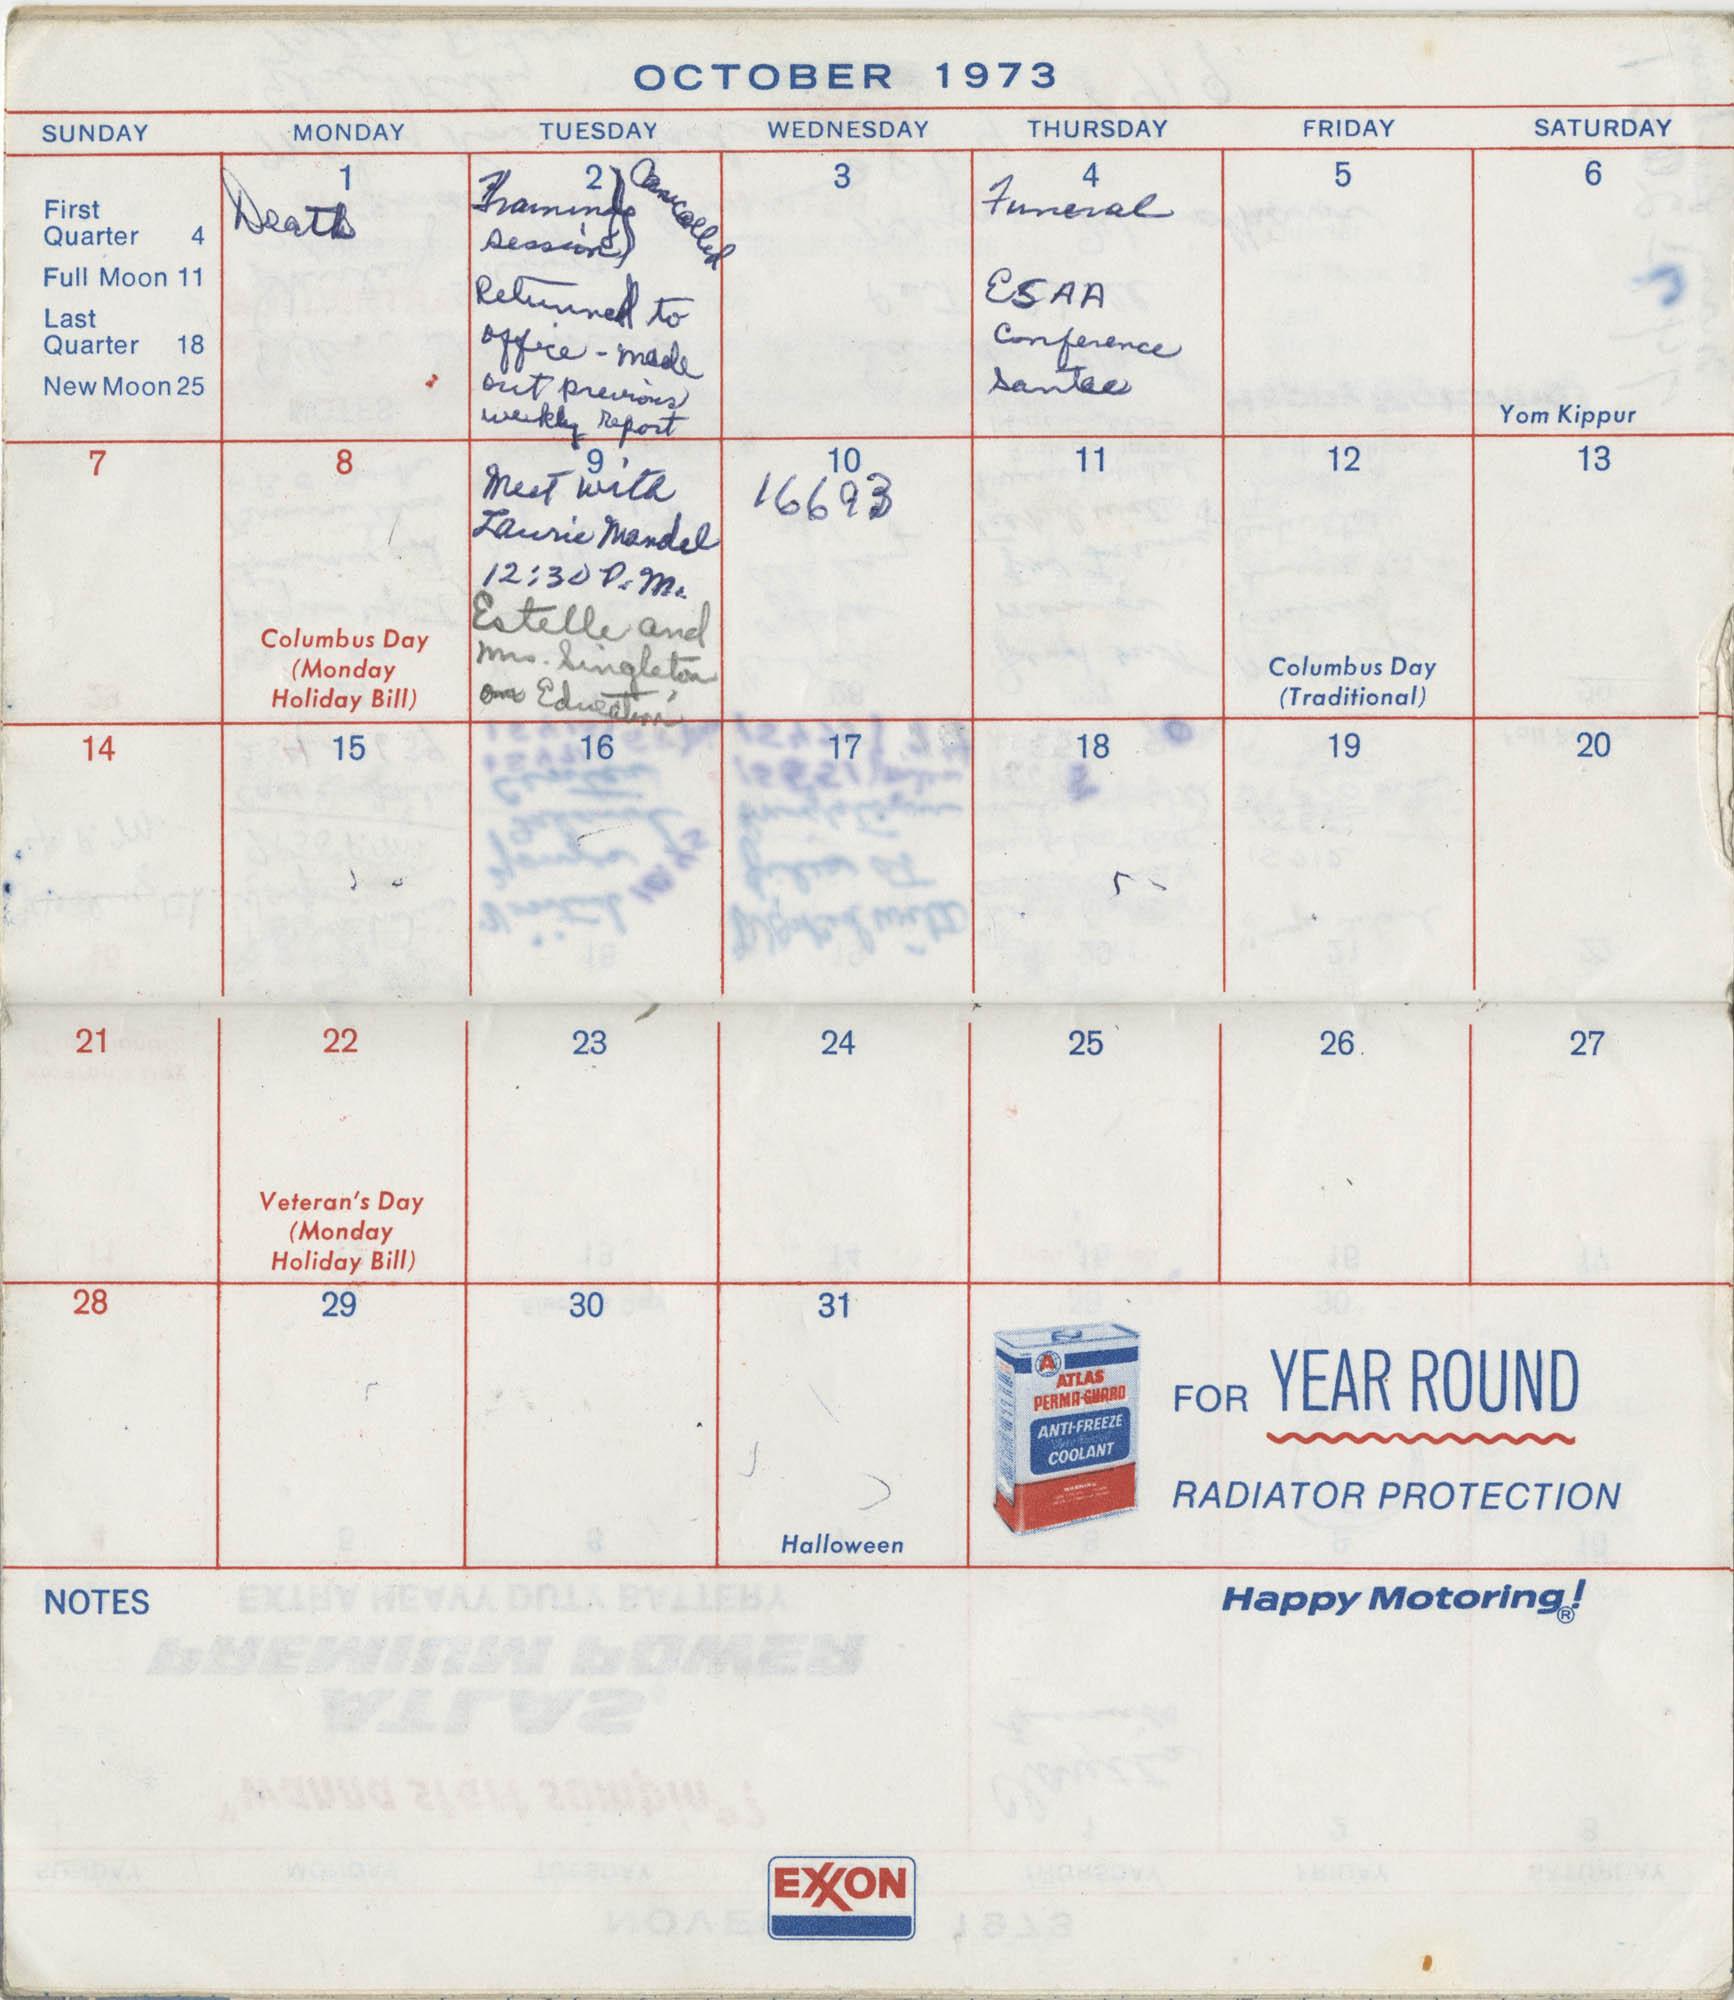 Bernice Robinson's 1973 Pocket Secretary, October